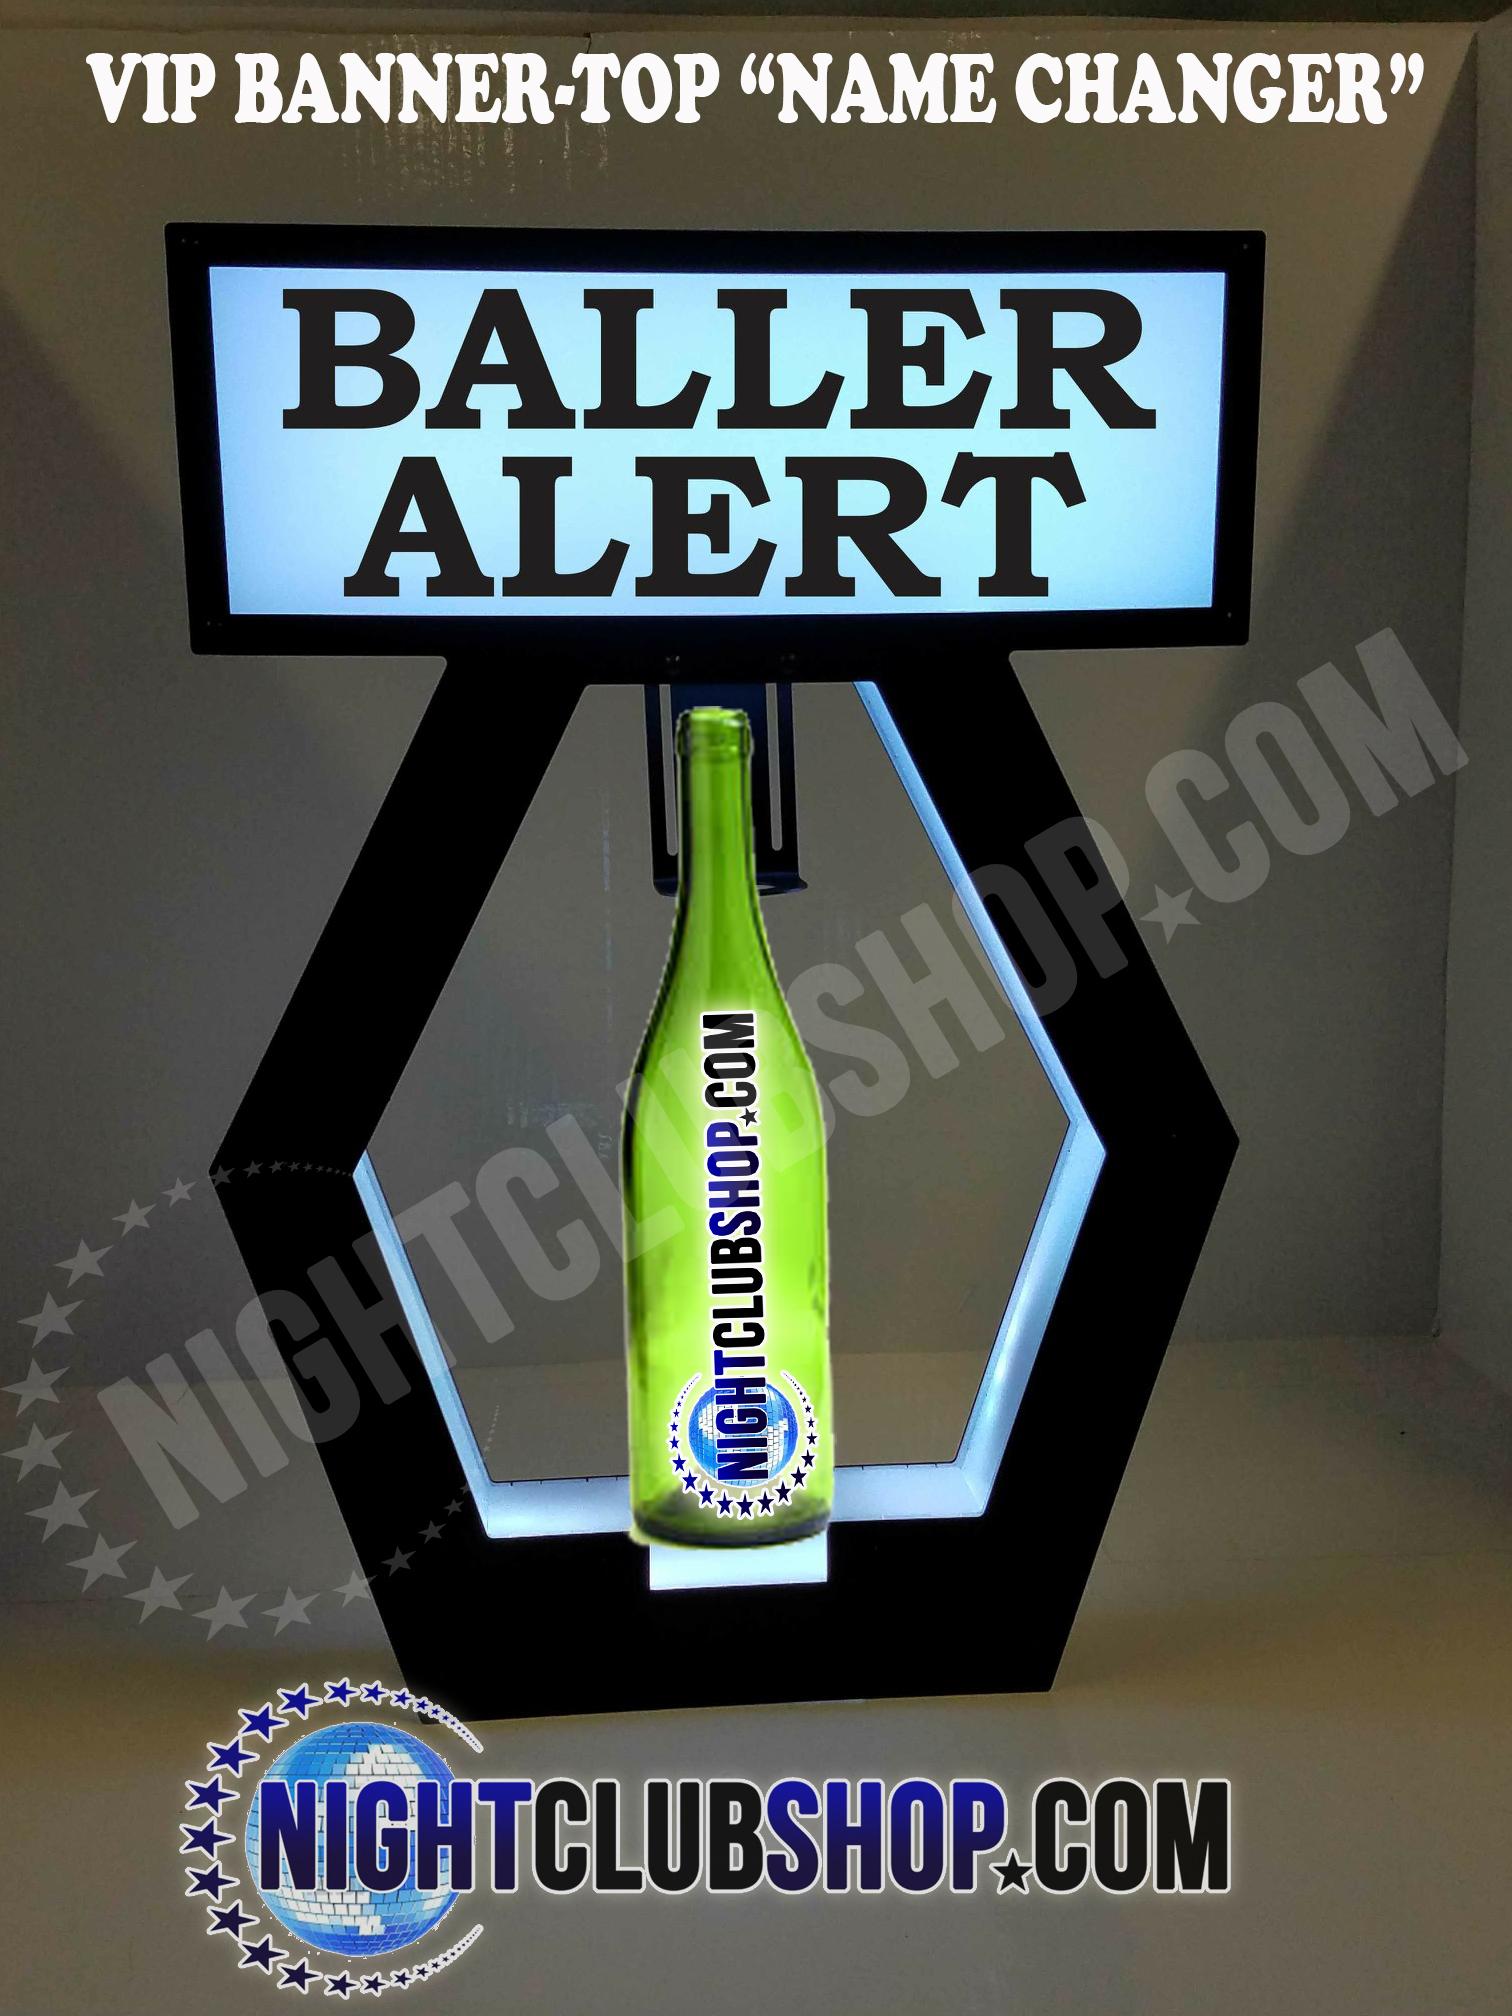 baller-alert-vip-banner-top-bottle-service-delivery-presenter-nightclubshop.jpg